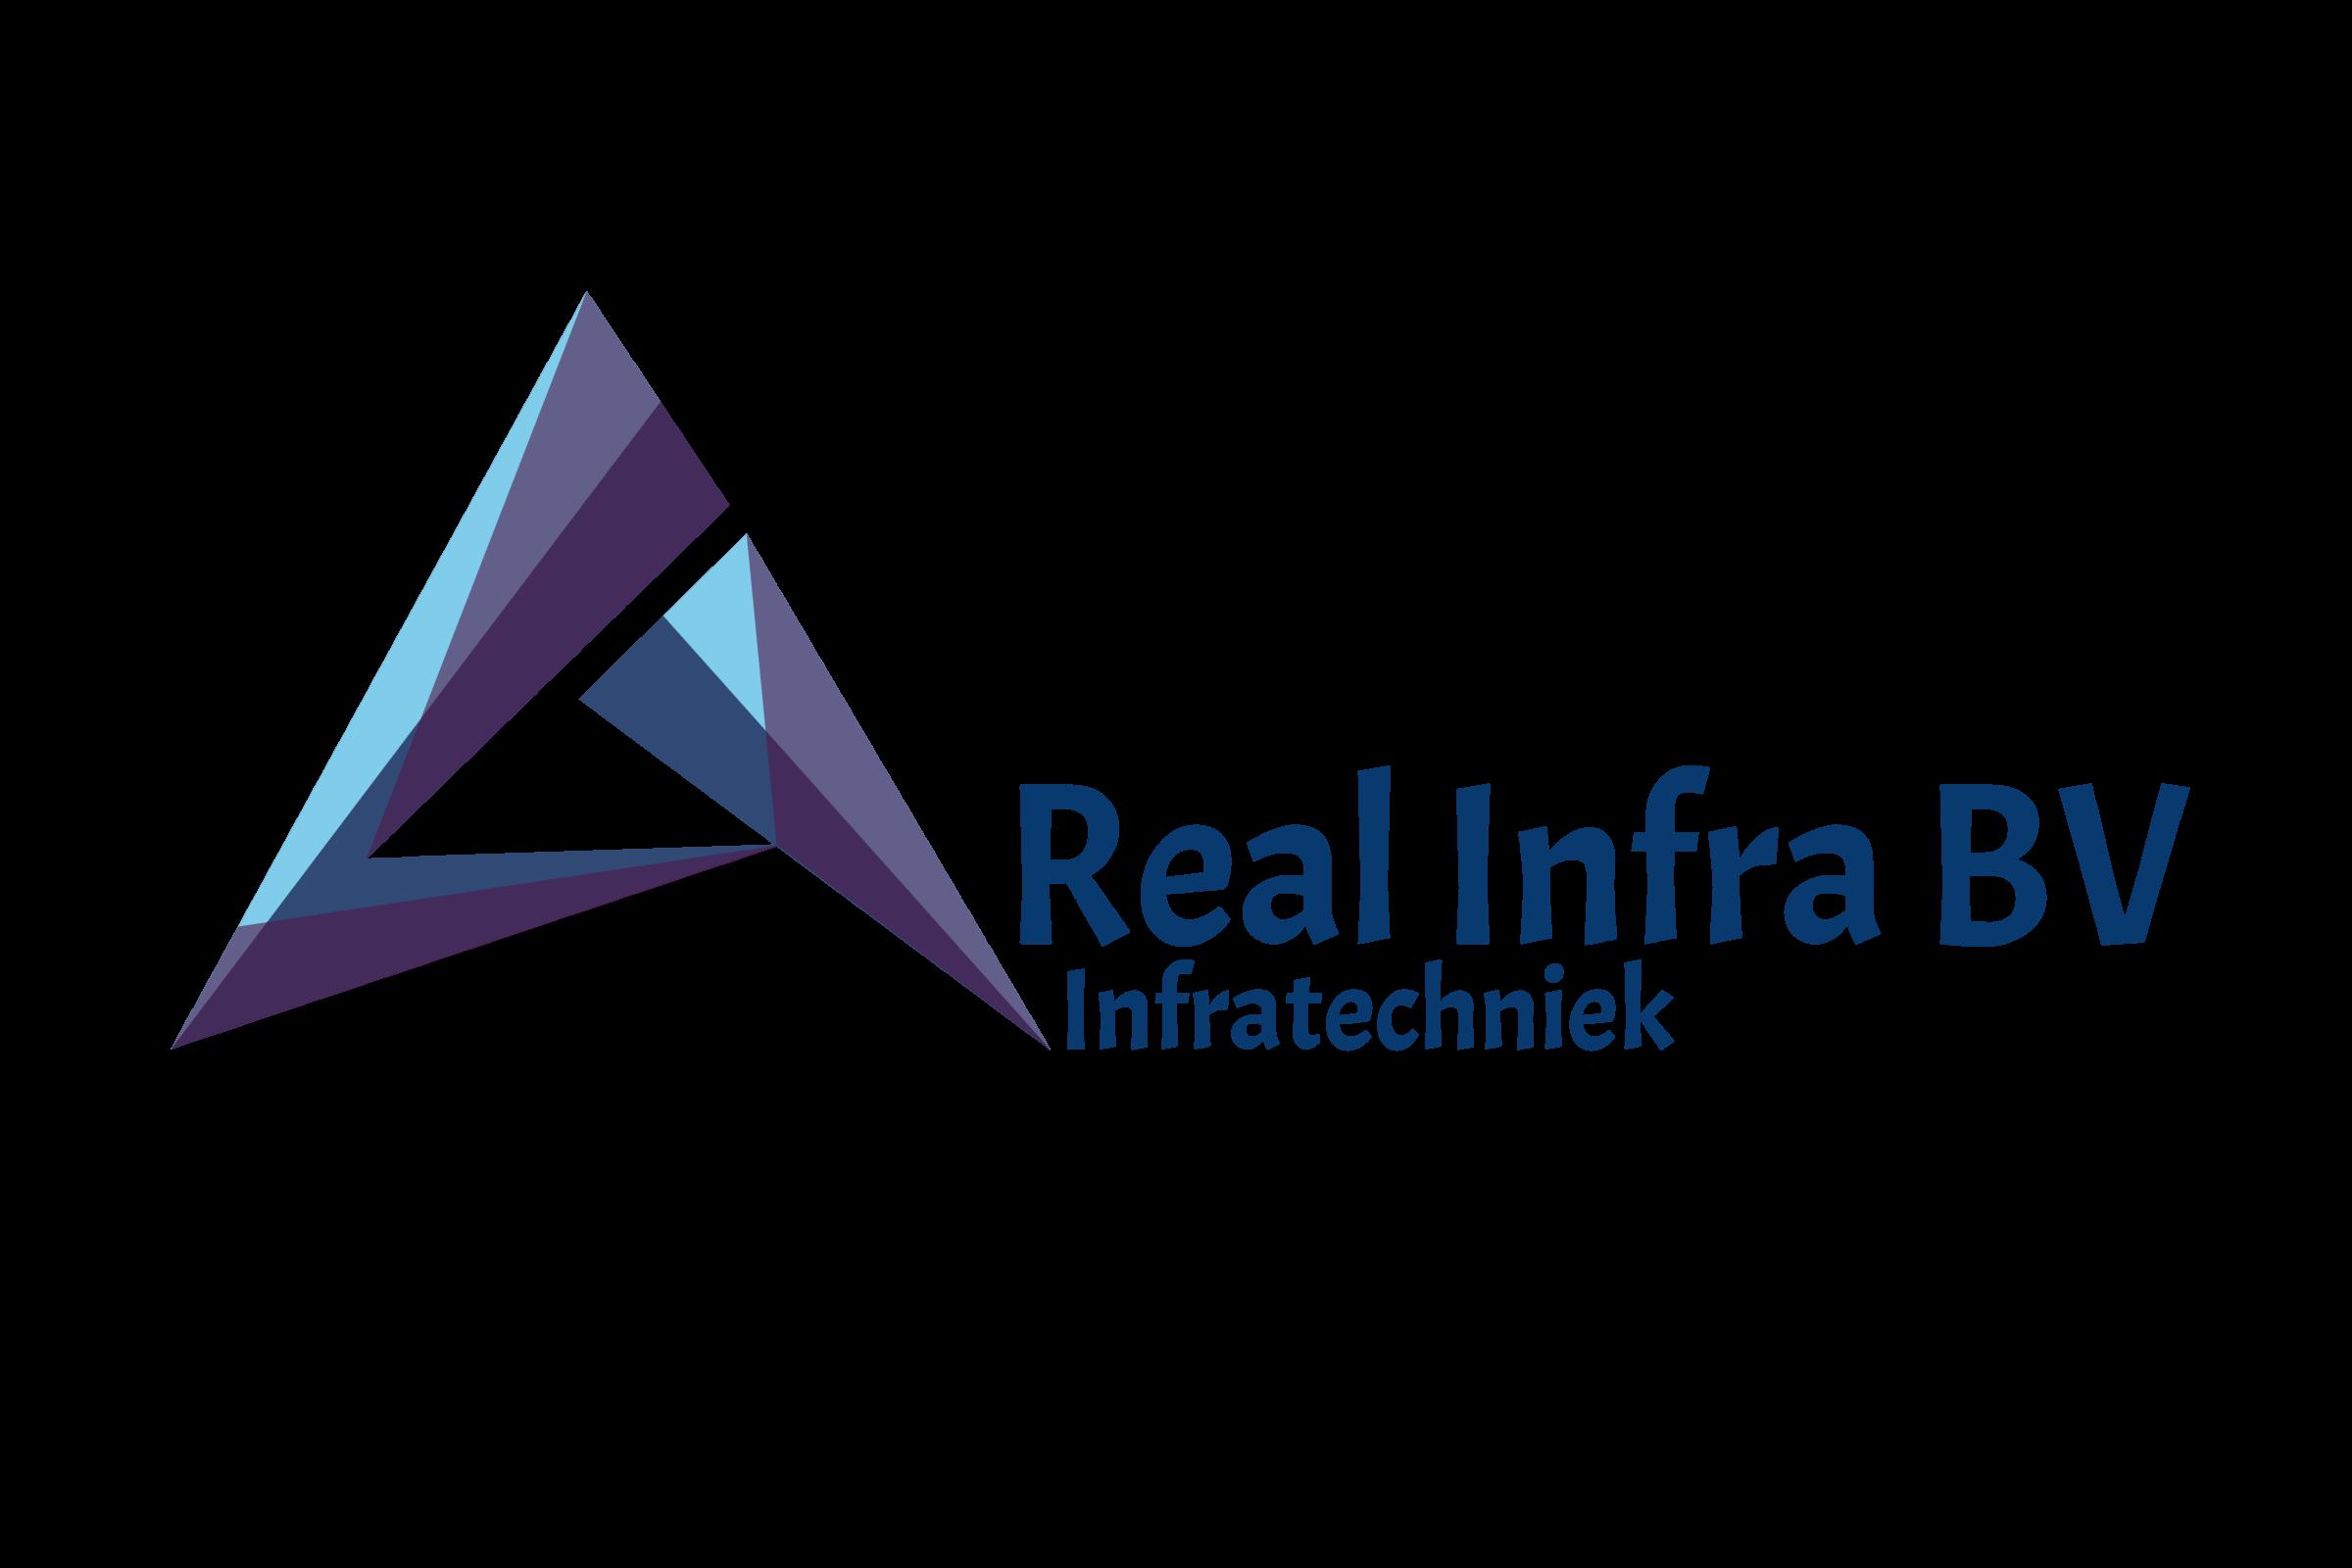 Real Infra